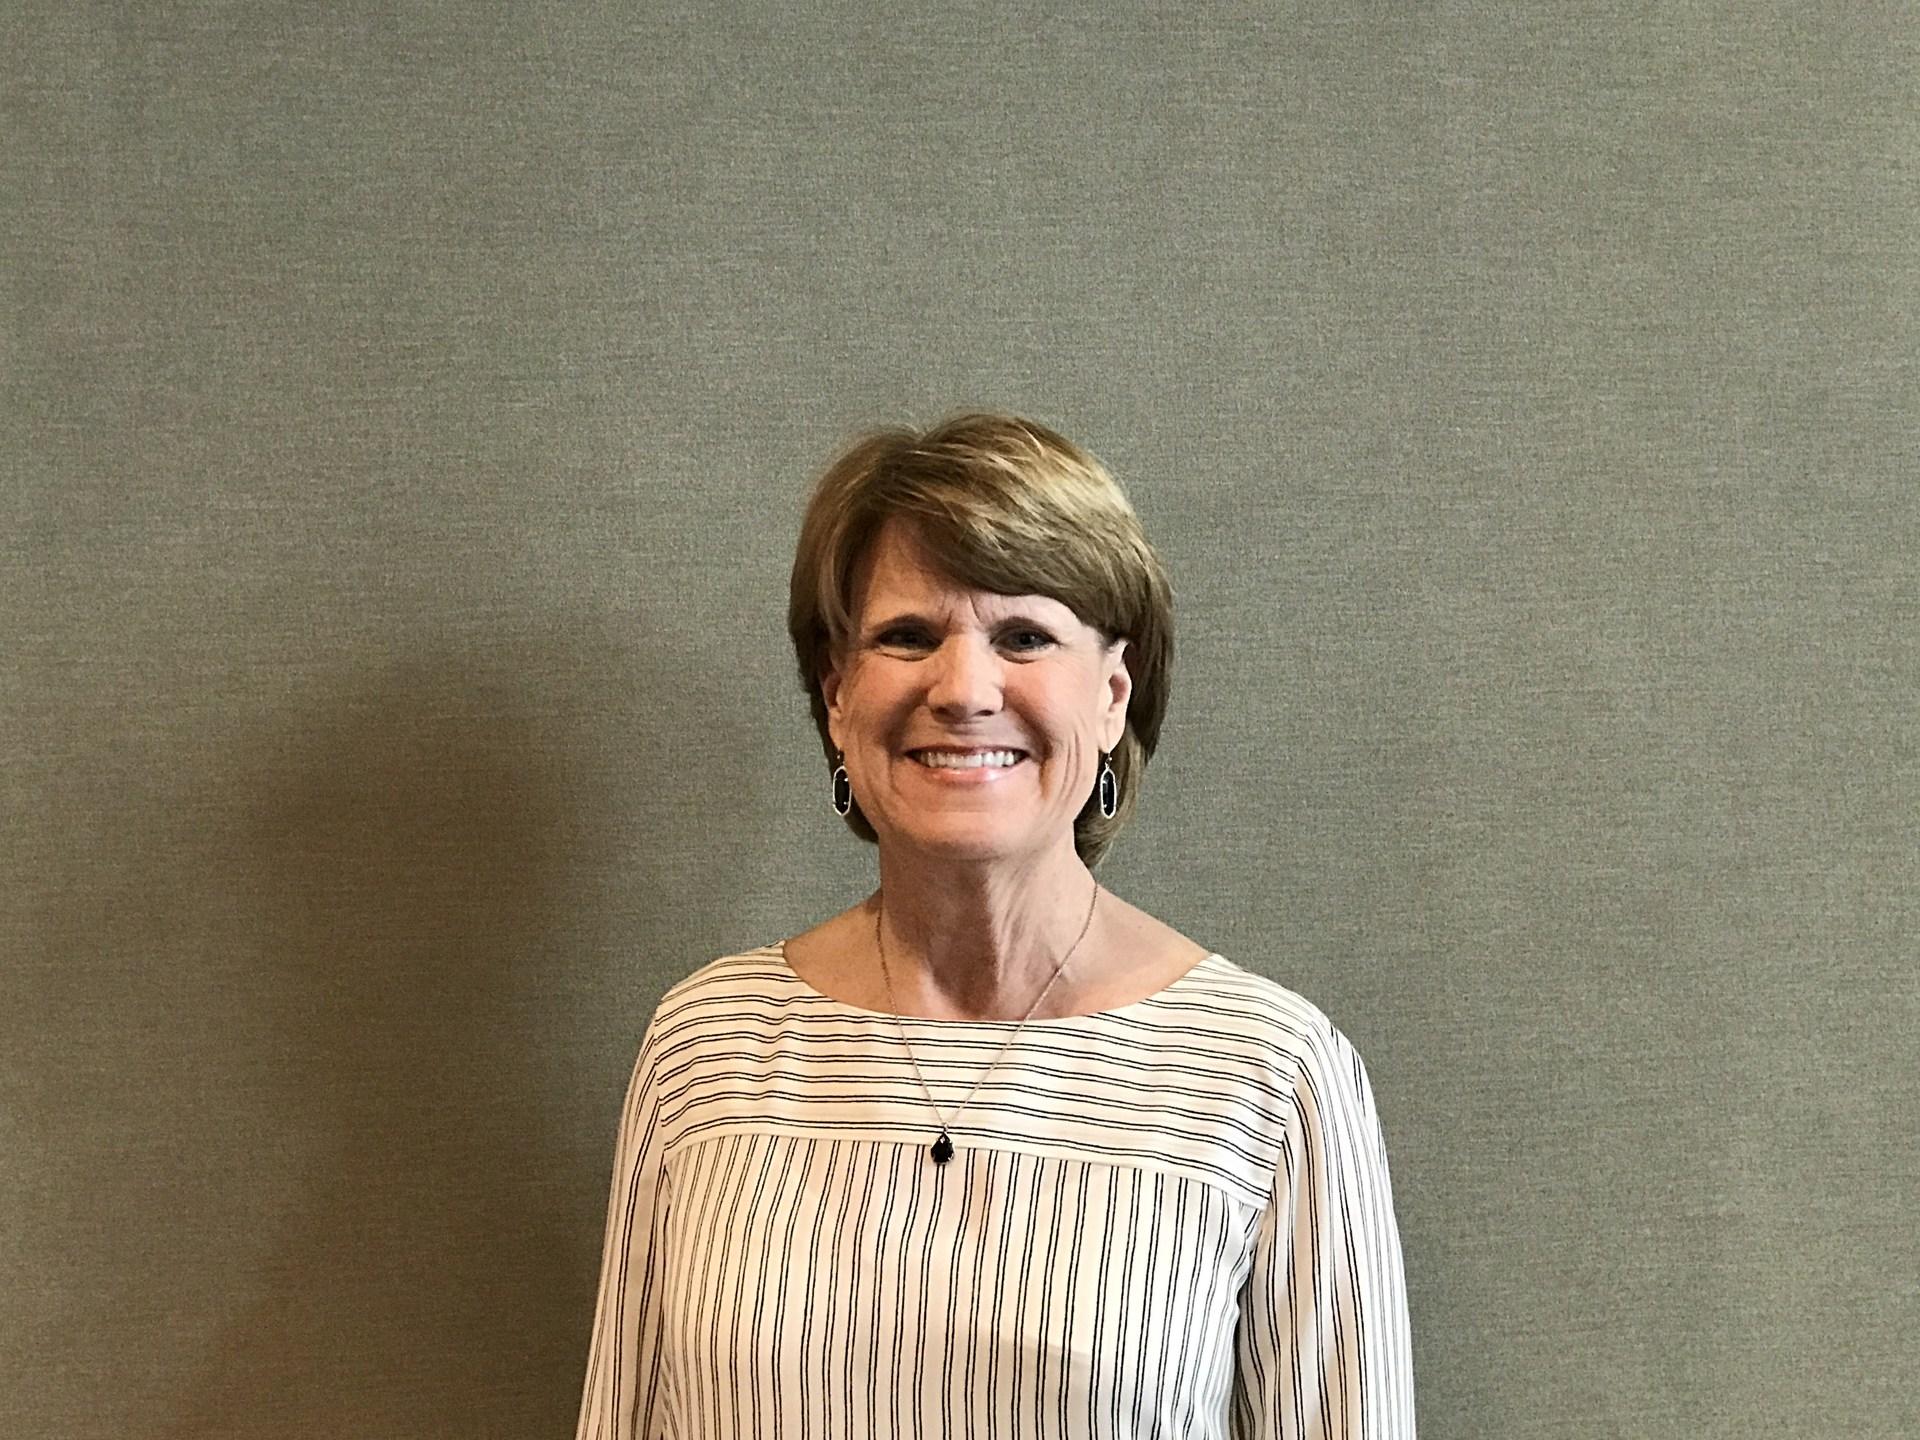 Lynne Bullock, Director of Instructional Technology